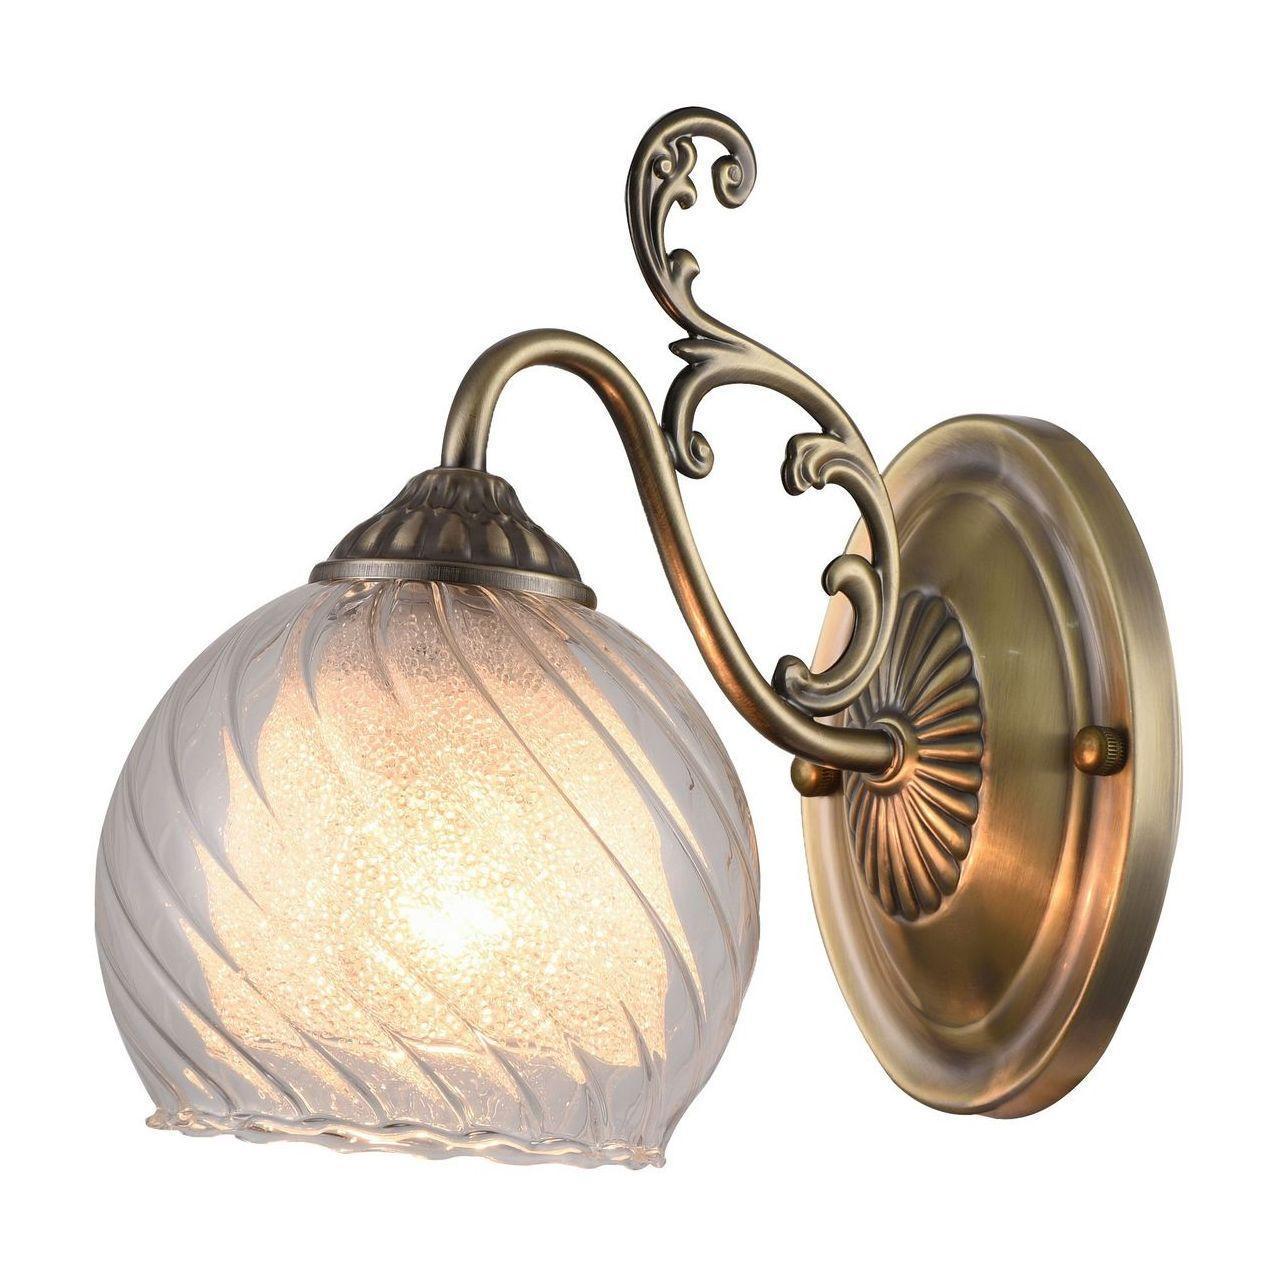 Бра Arte Lamp A7062AP-1AB бра arte lamp 7062 a7062ap 1wg